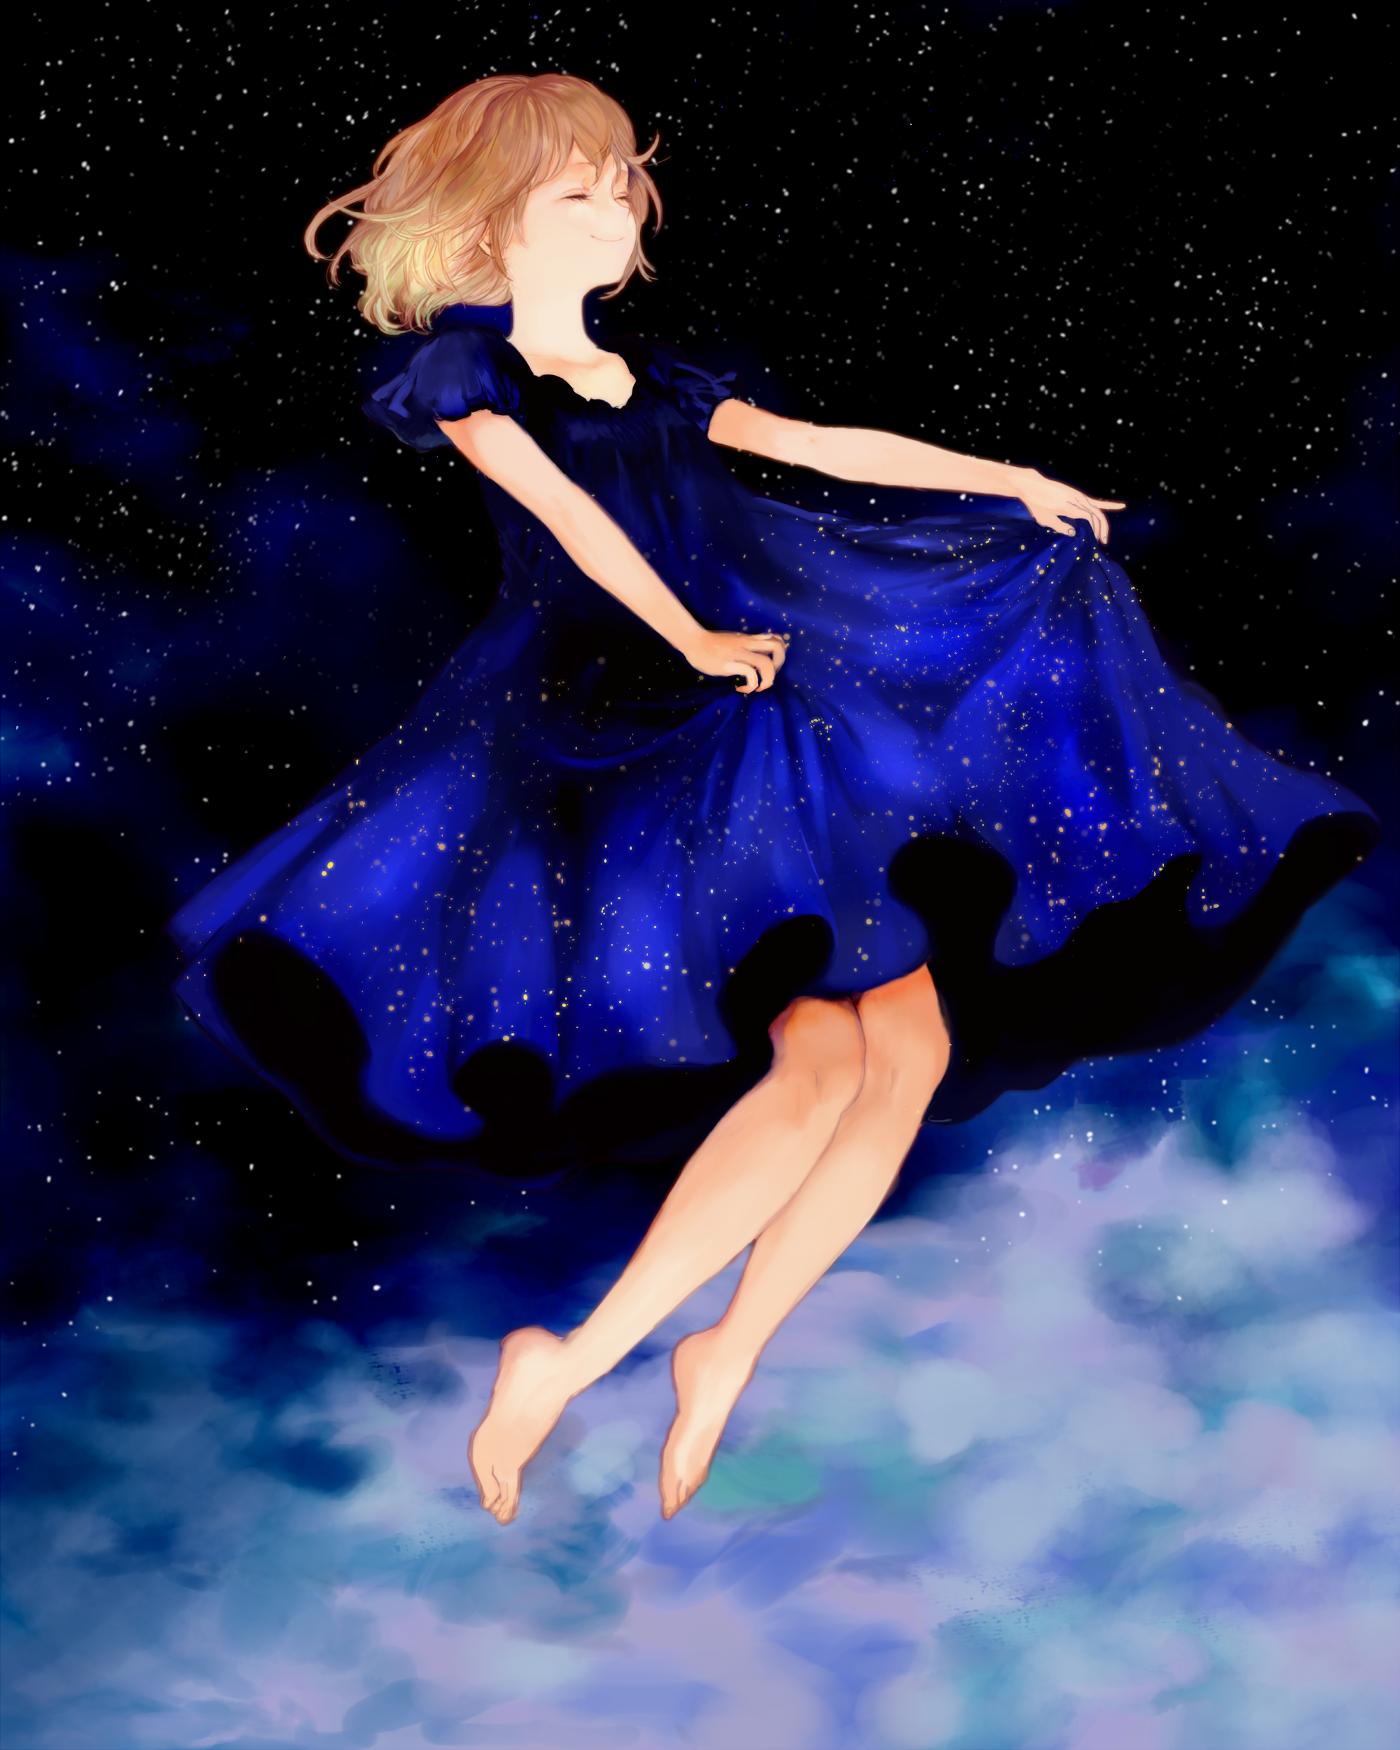 id=34489731,动漫唯美壁纸,星空唯美壁纸,动漫女生图片